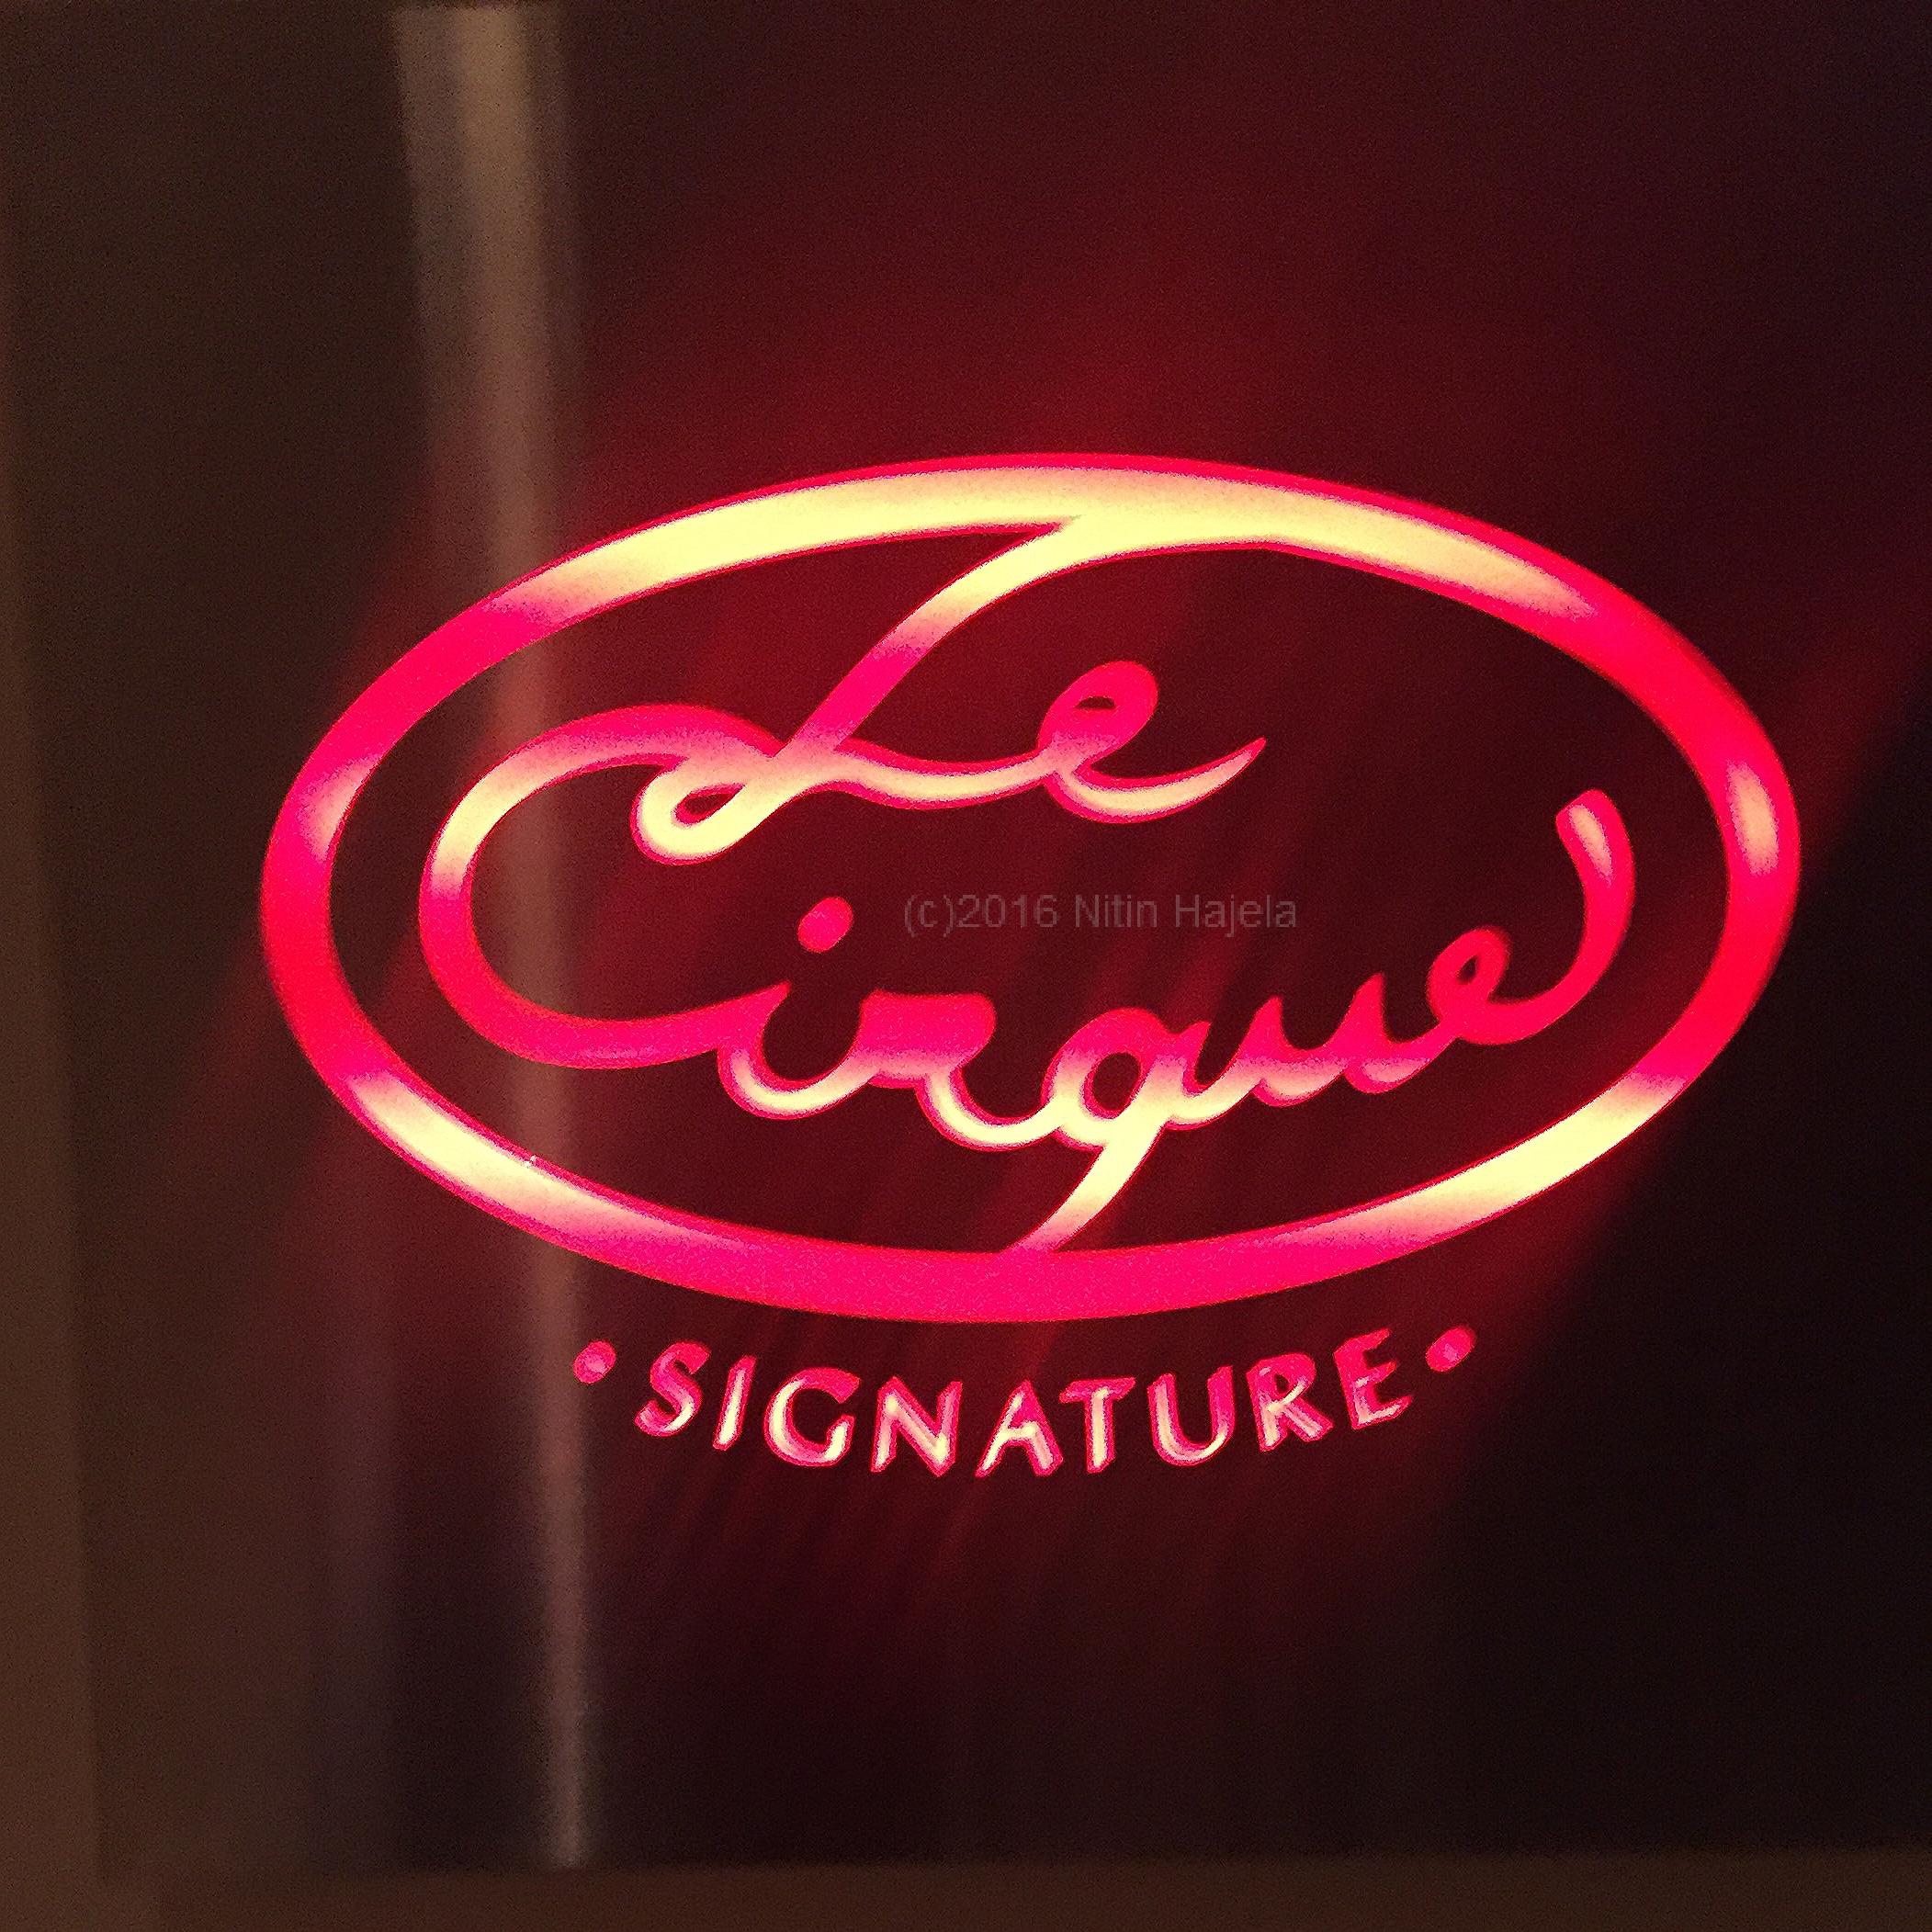 Restaurant Review : Le Cirque Signature, Bangalore – celebrating gastronomical spectacle | India